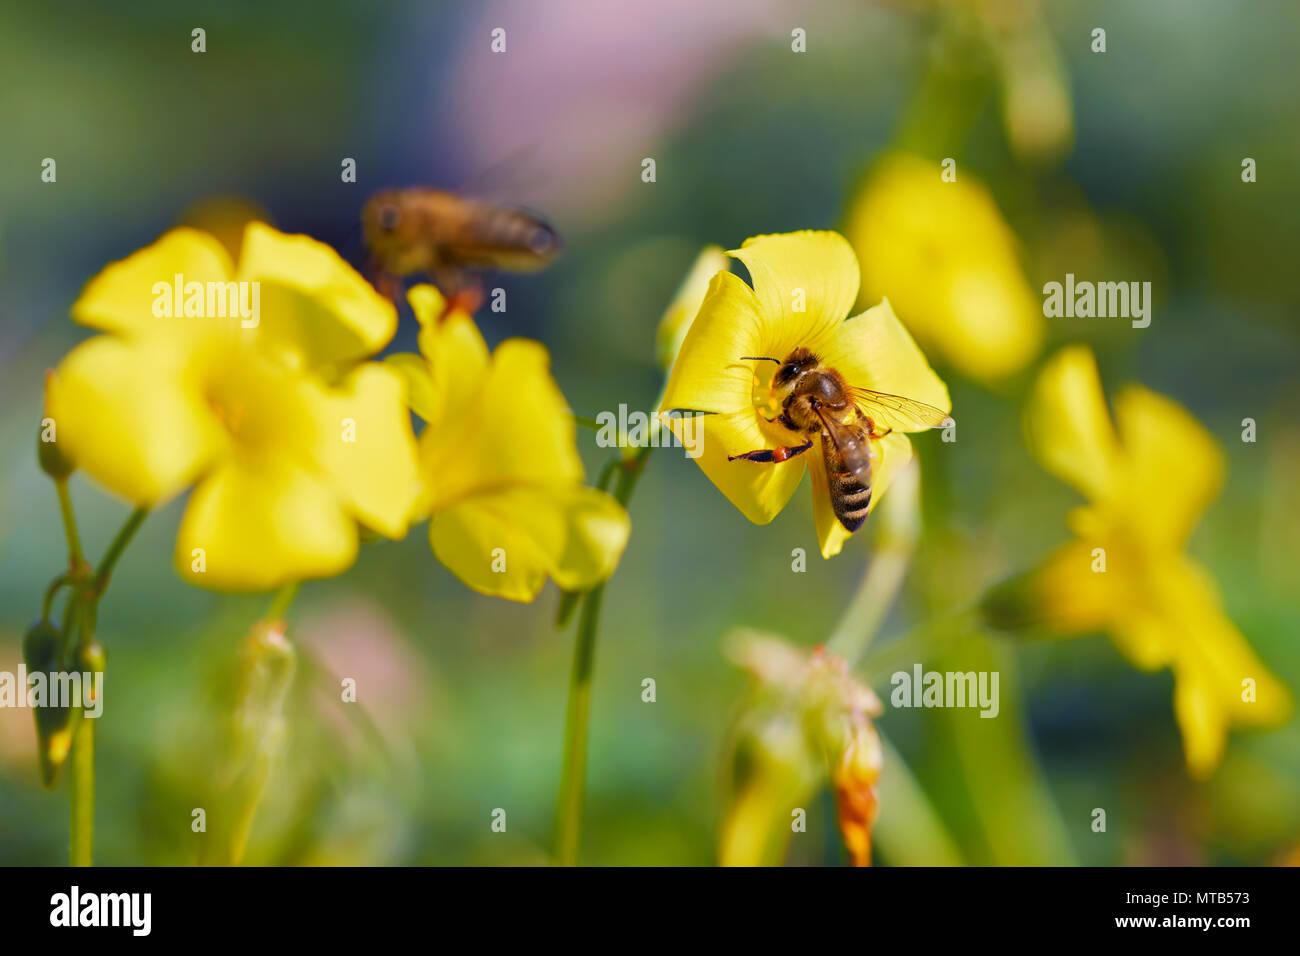 Honey bee collecting pollen from yellow jasmine flower - Stock Image